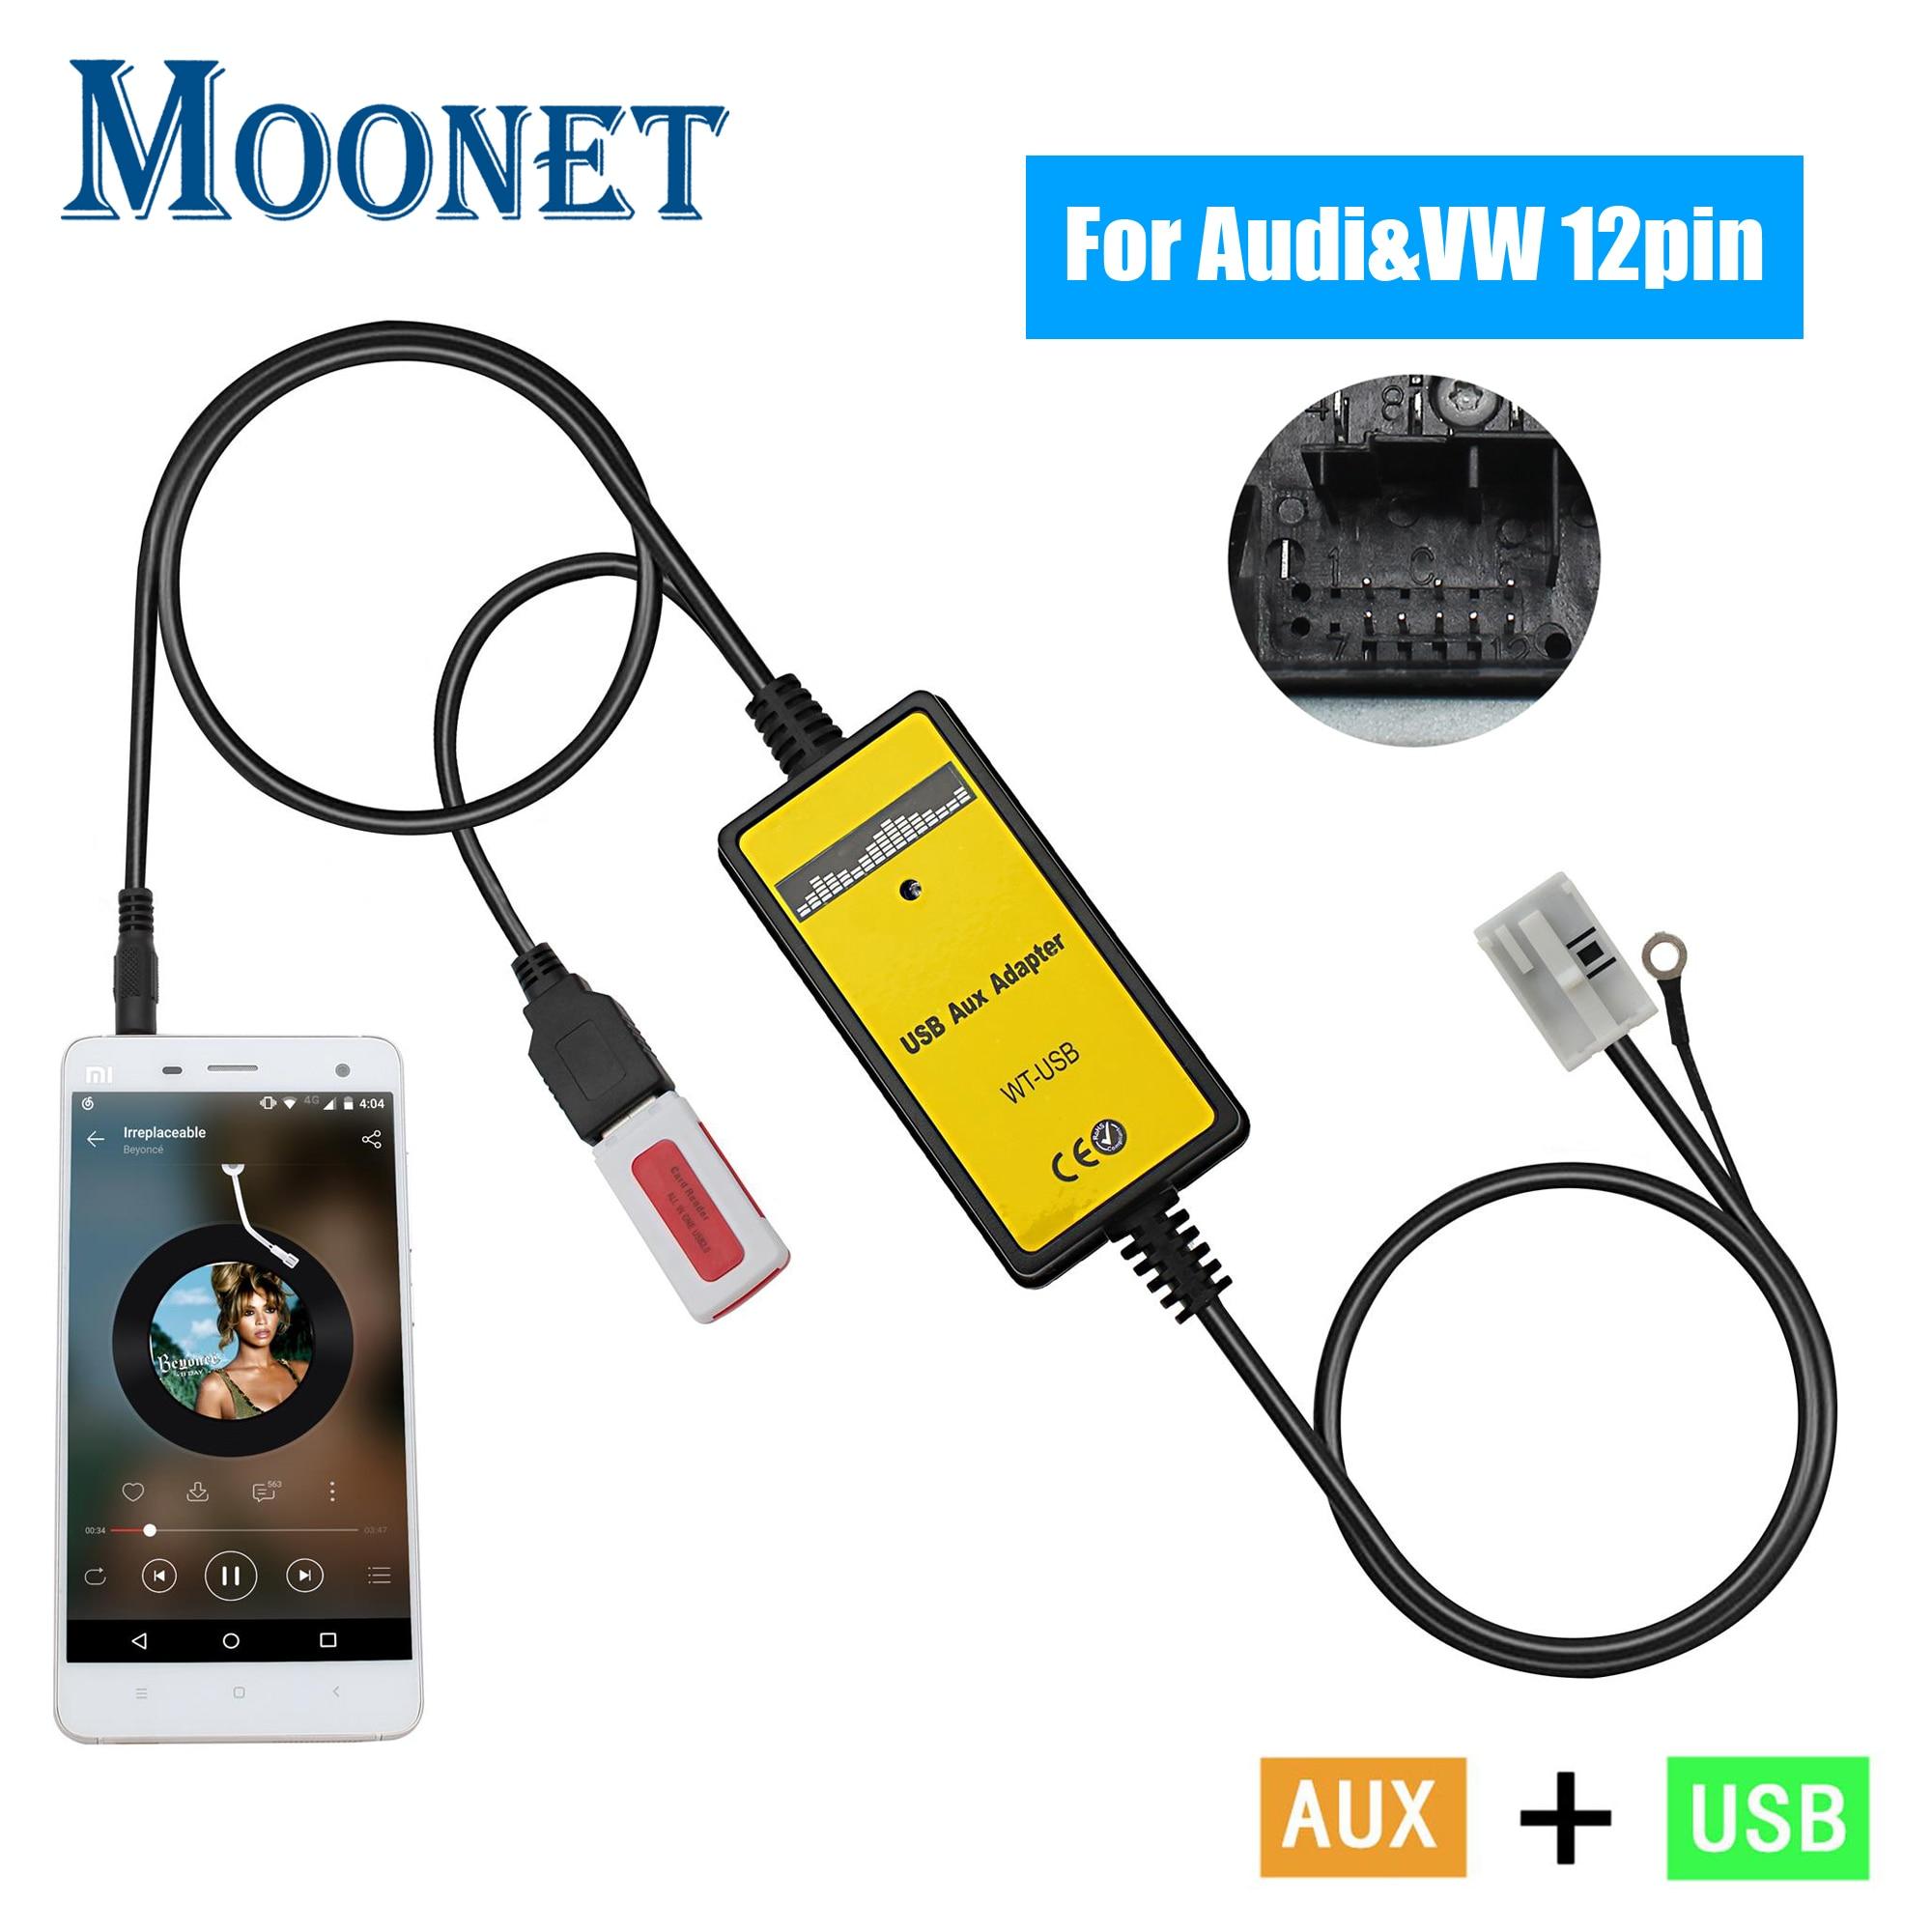 Moonet Car Audio MP3 AUX Adapter 3.5mm AUX USB Interface CD Changer For Audi Volkswagen Tiguan Touran T5 Golf Passat QX091(China)